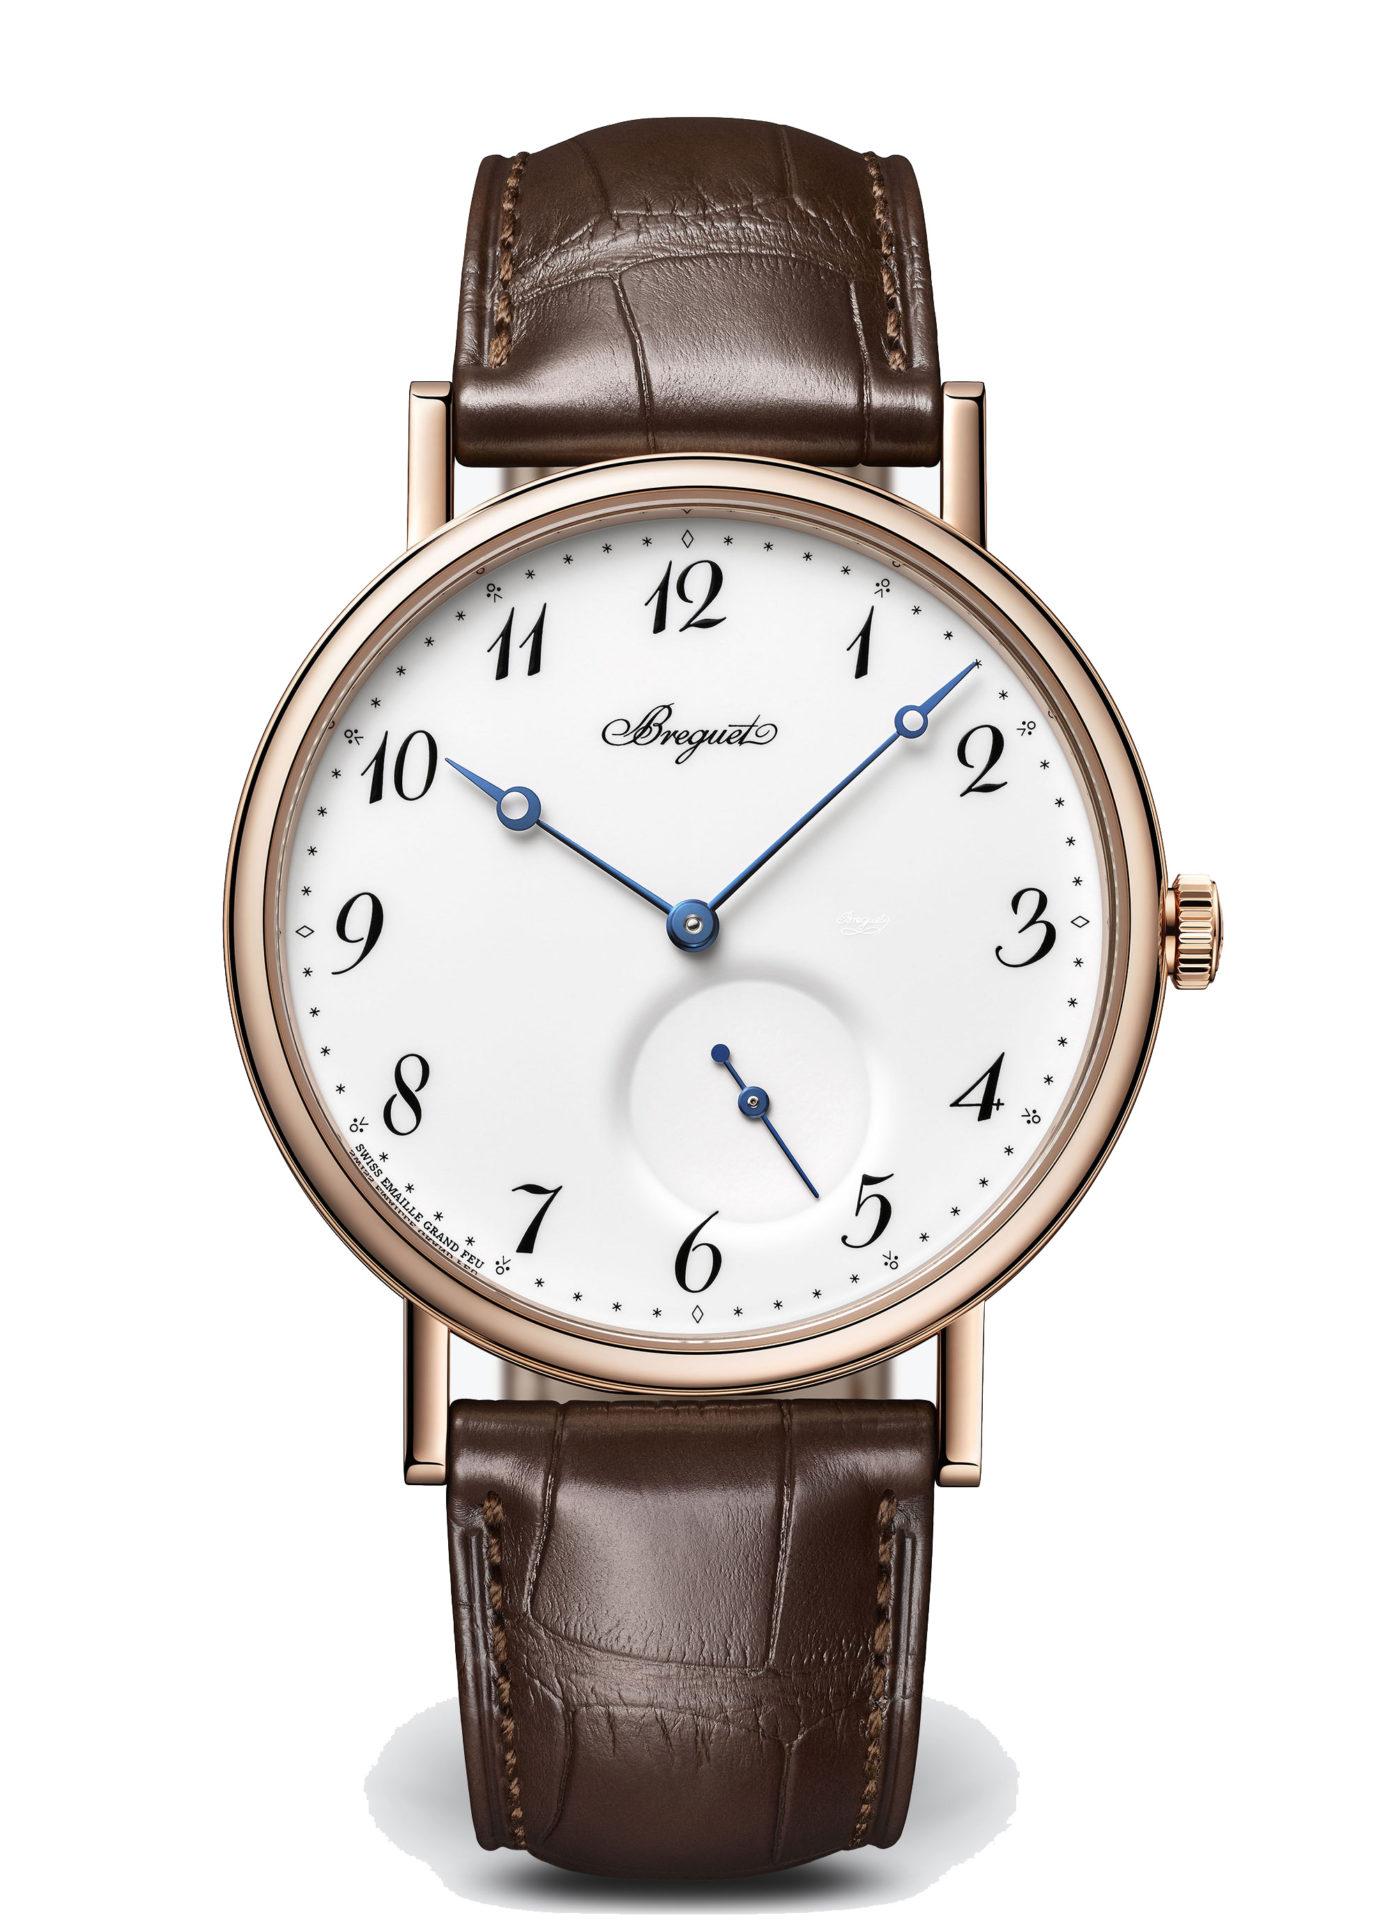 Breguet-Classique-7147-Hall-of-Time-7147br-29-9wu copie